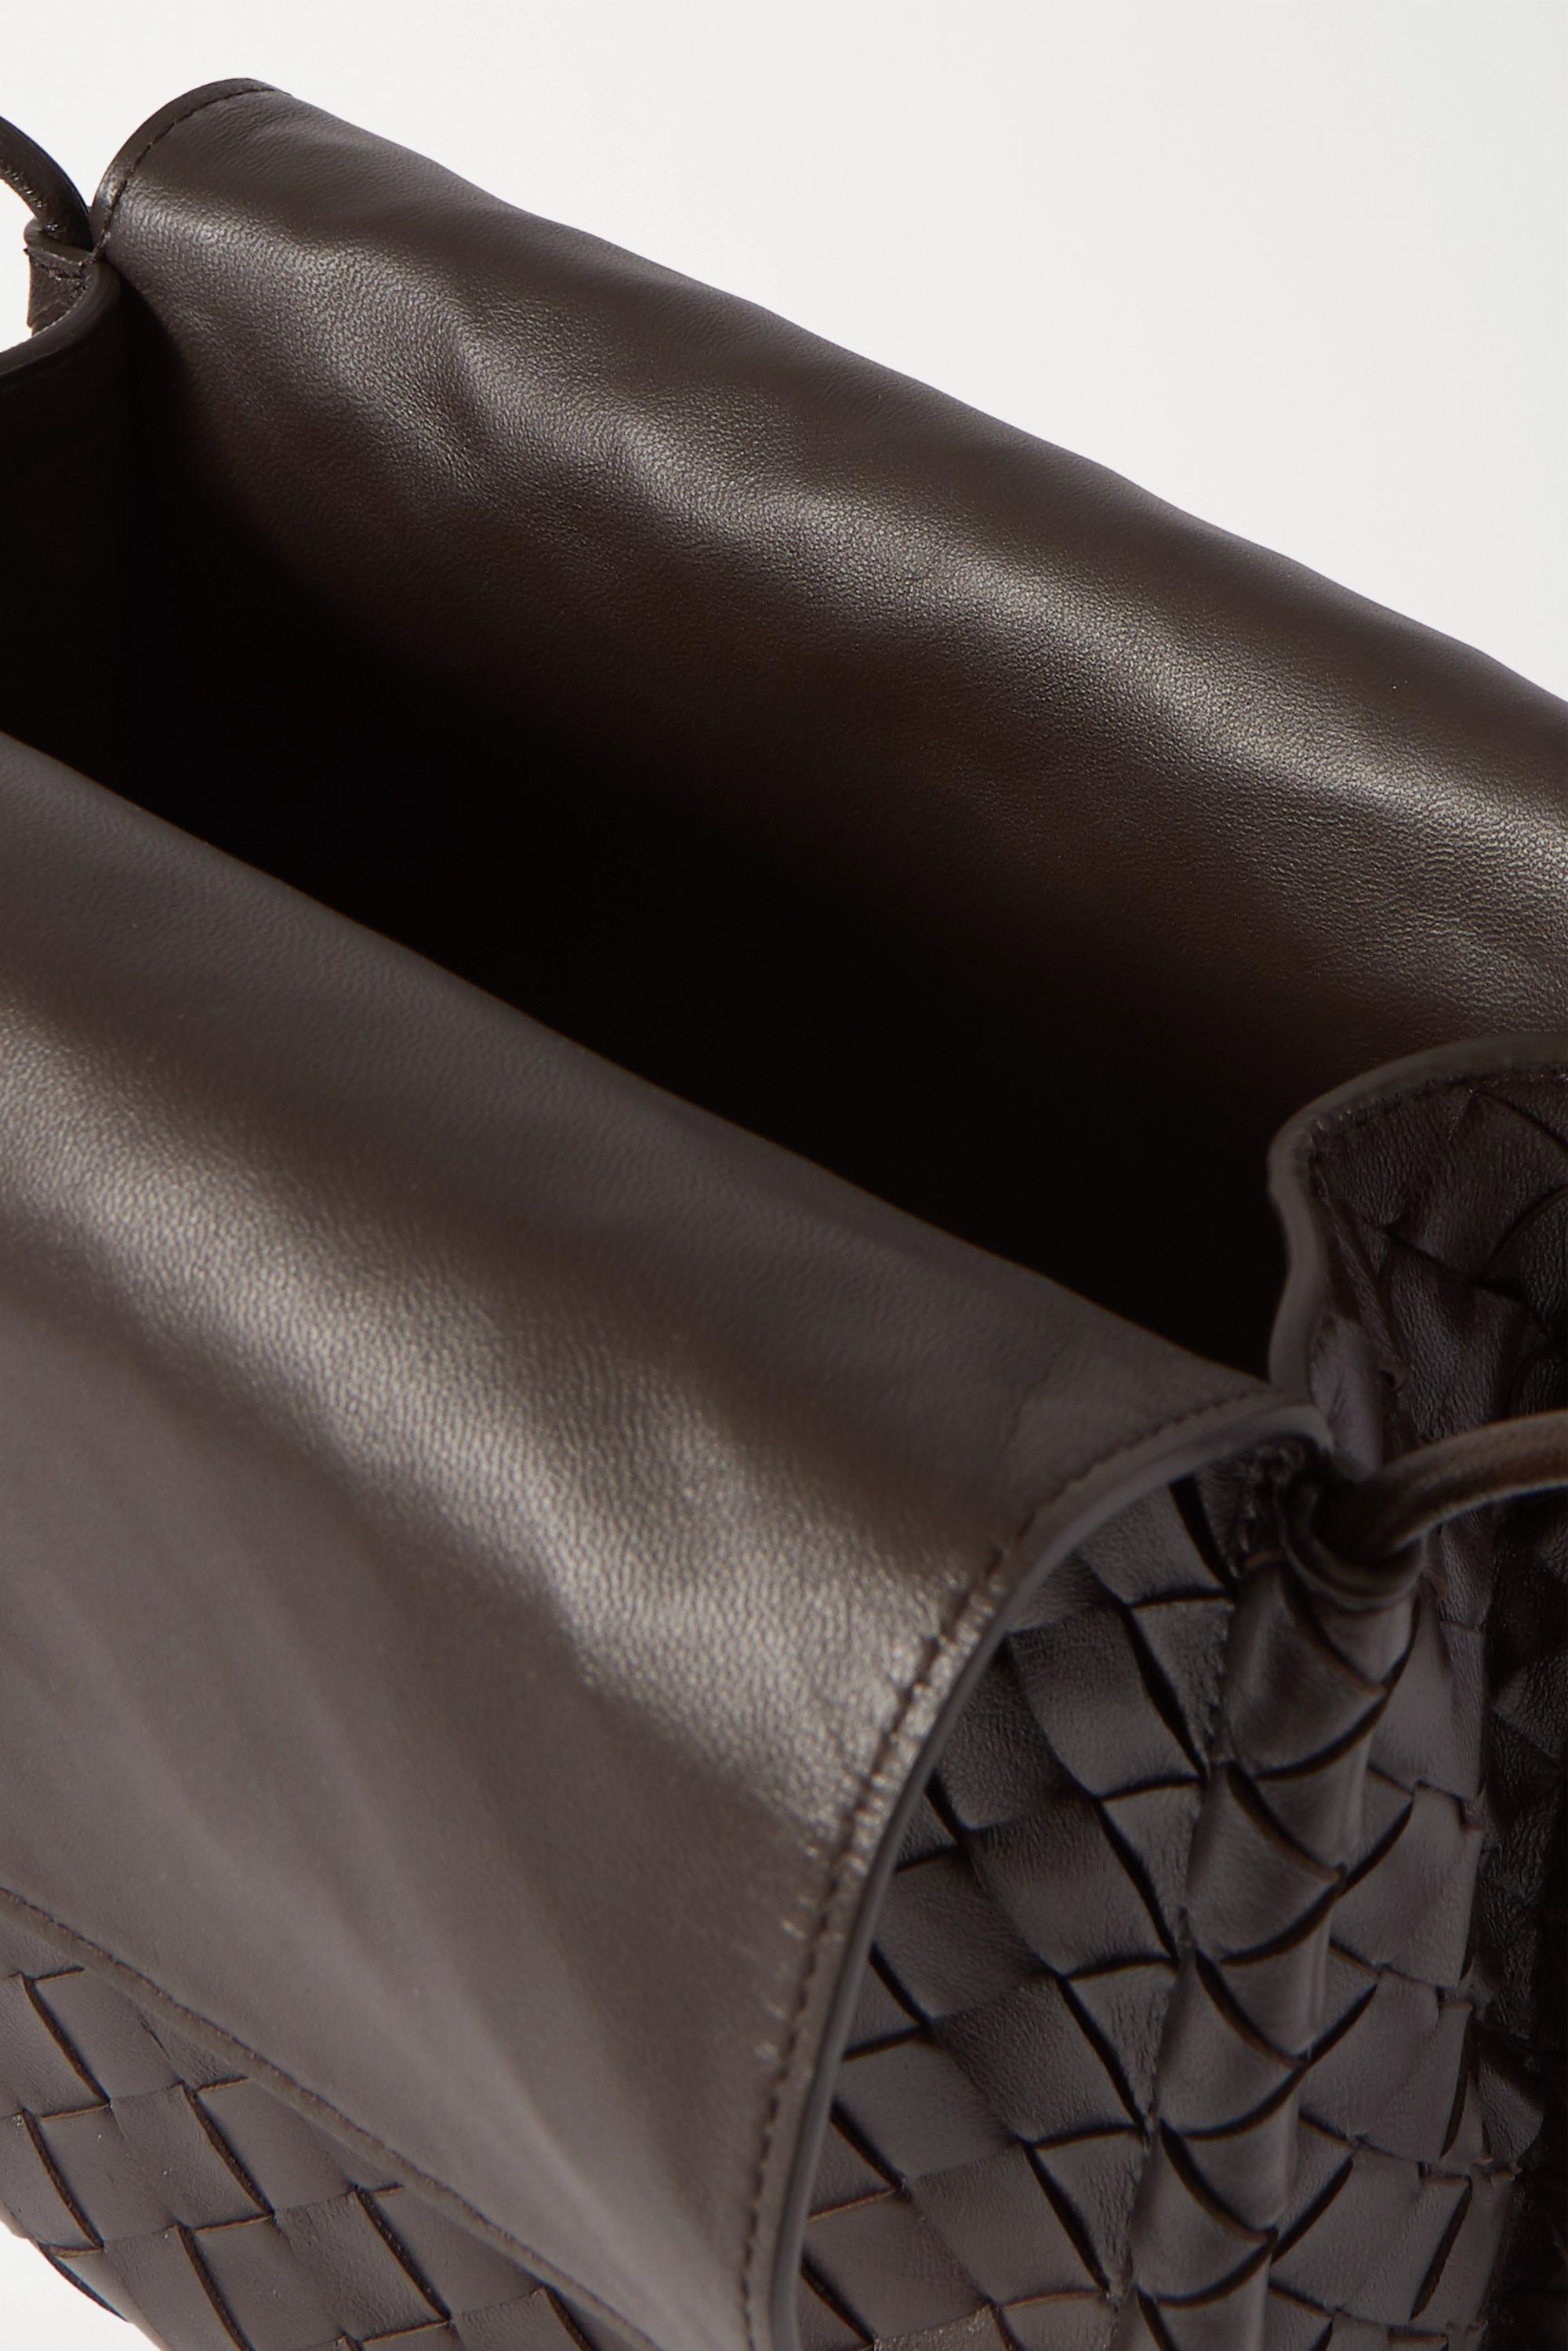 Bottega Veneta Fold intrecciato leather shoulder bag